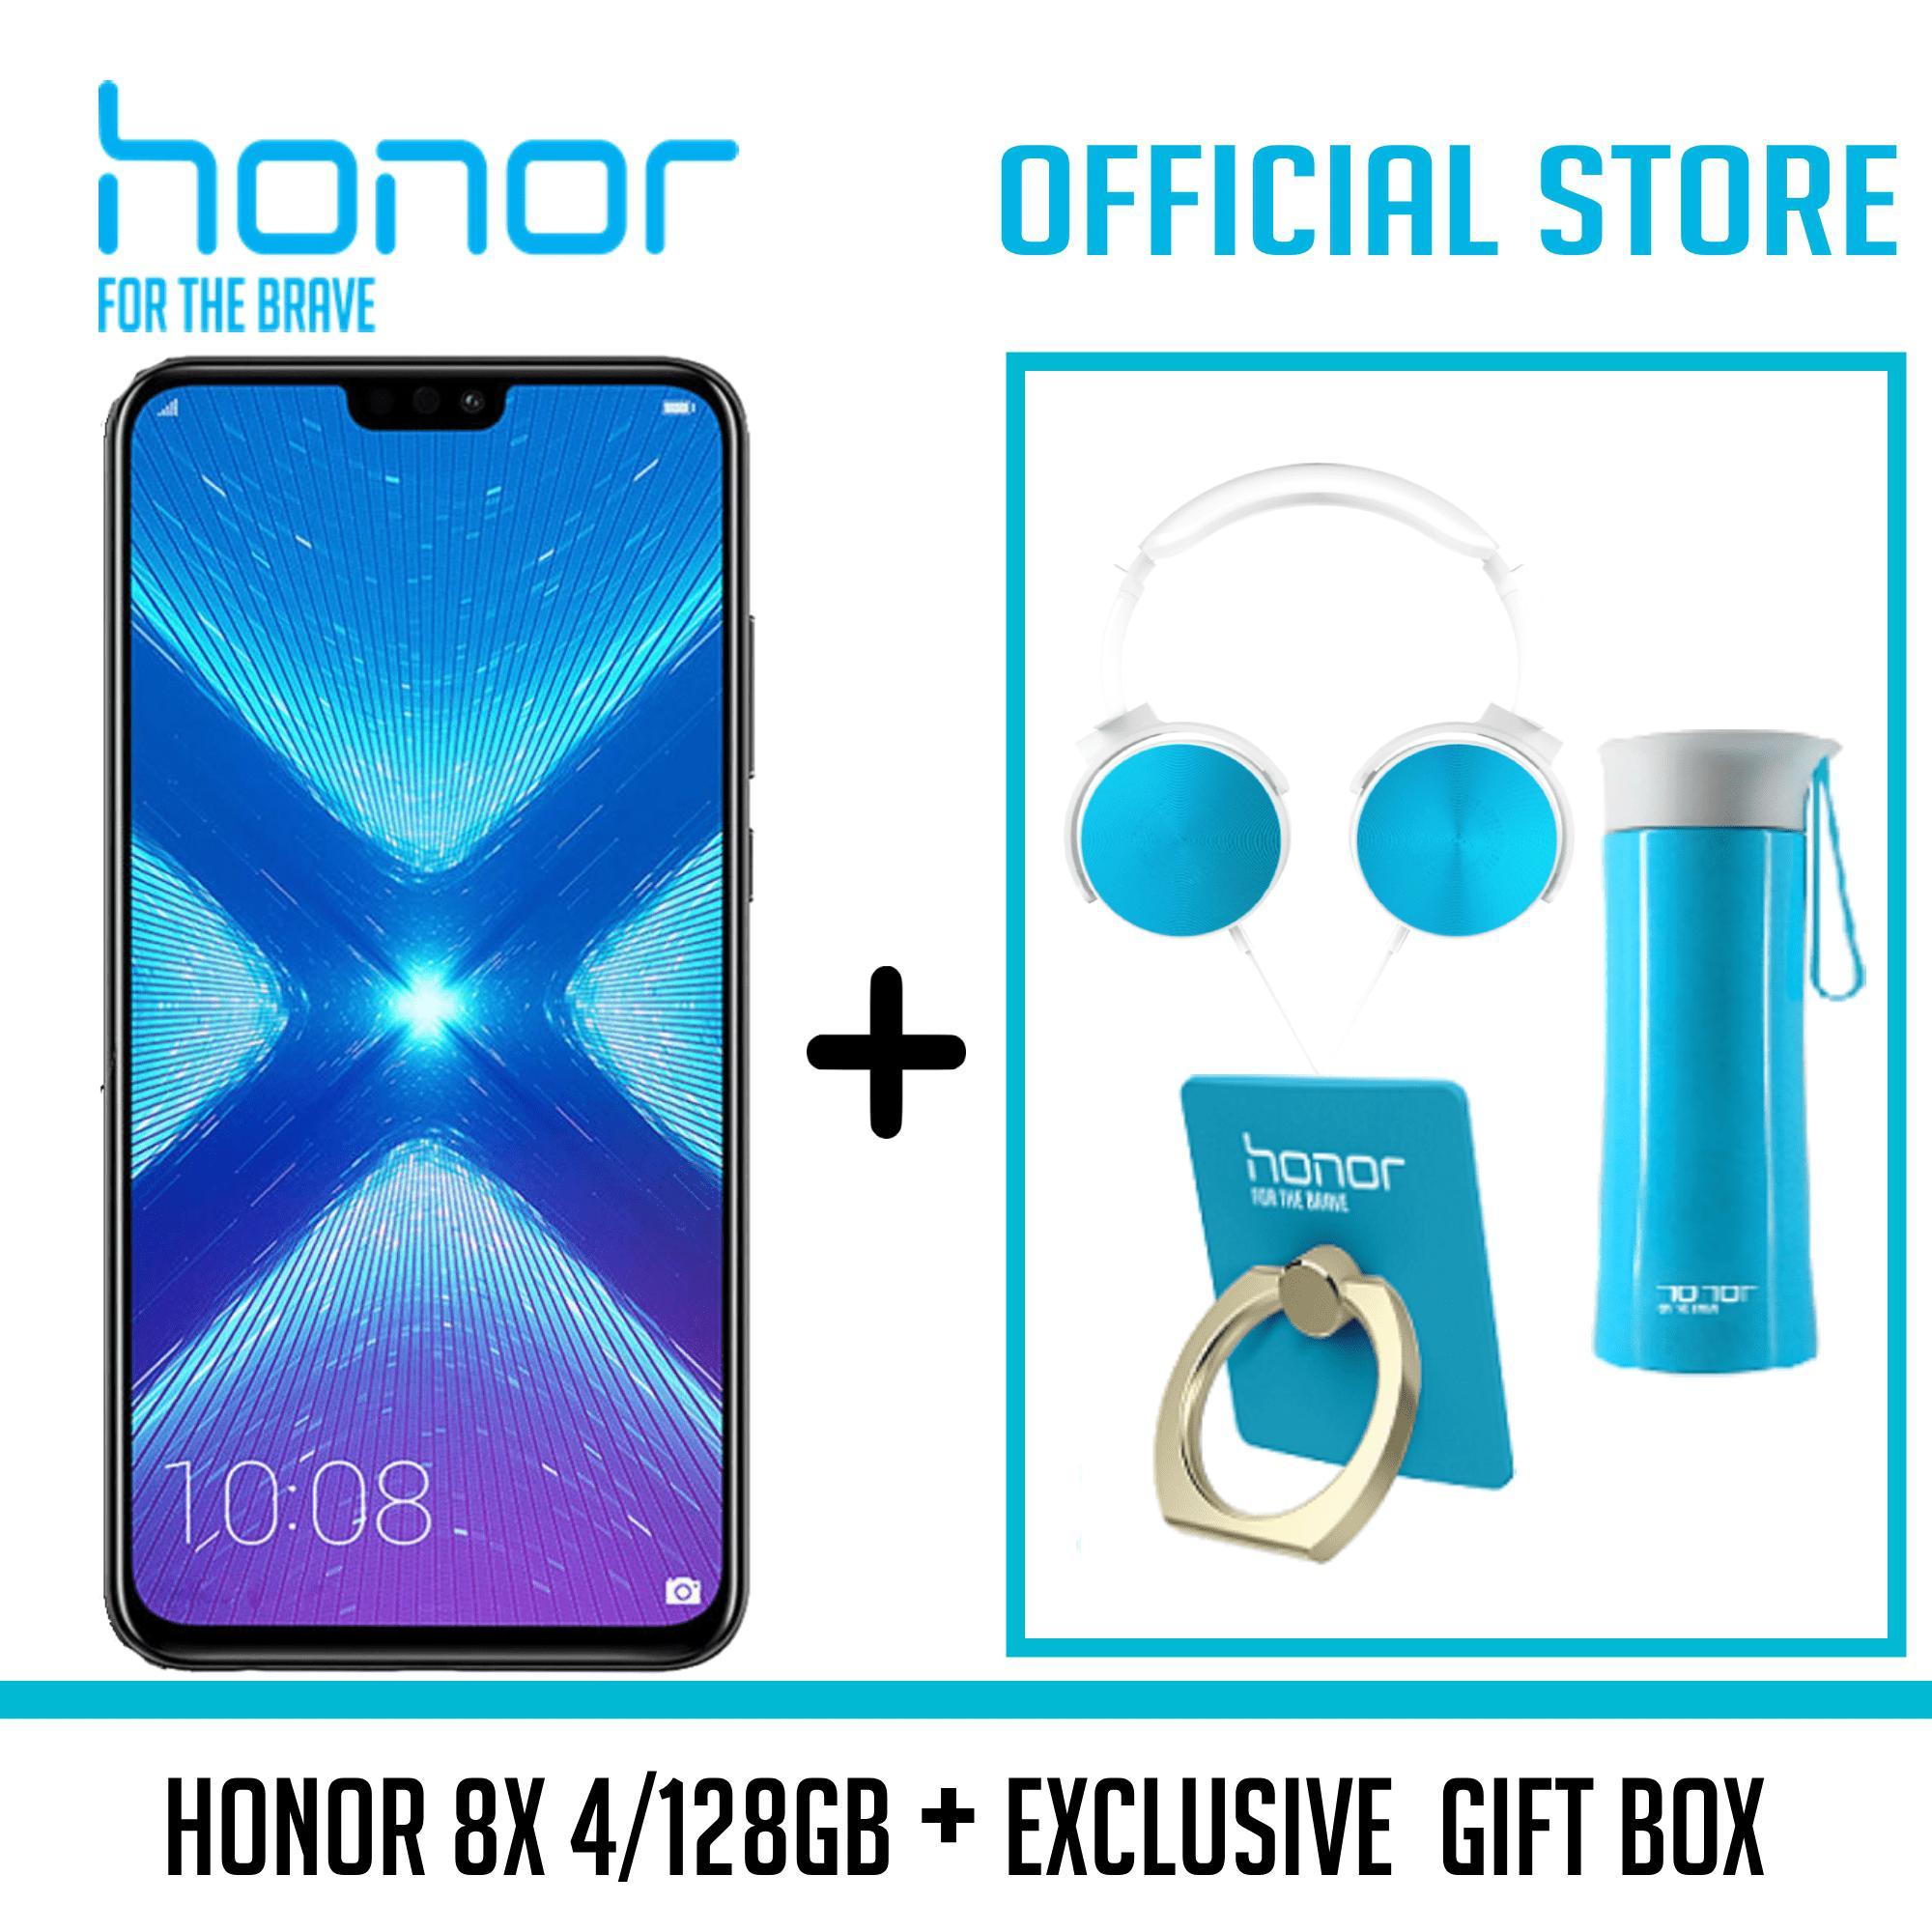 Honor 8X 4/128GB – Free Honor 8x Exclusive Gift Box